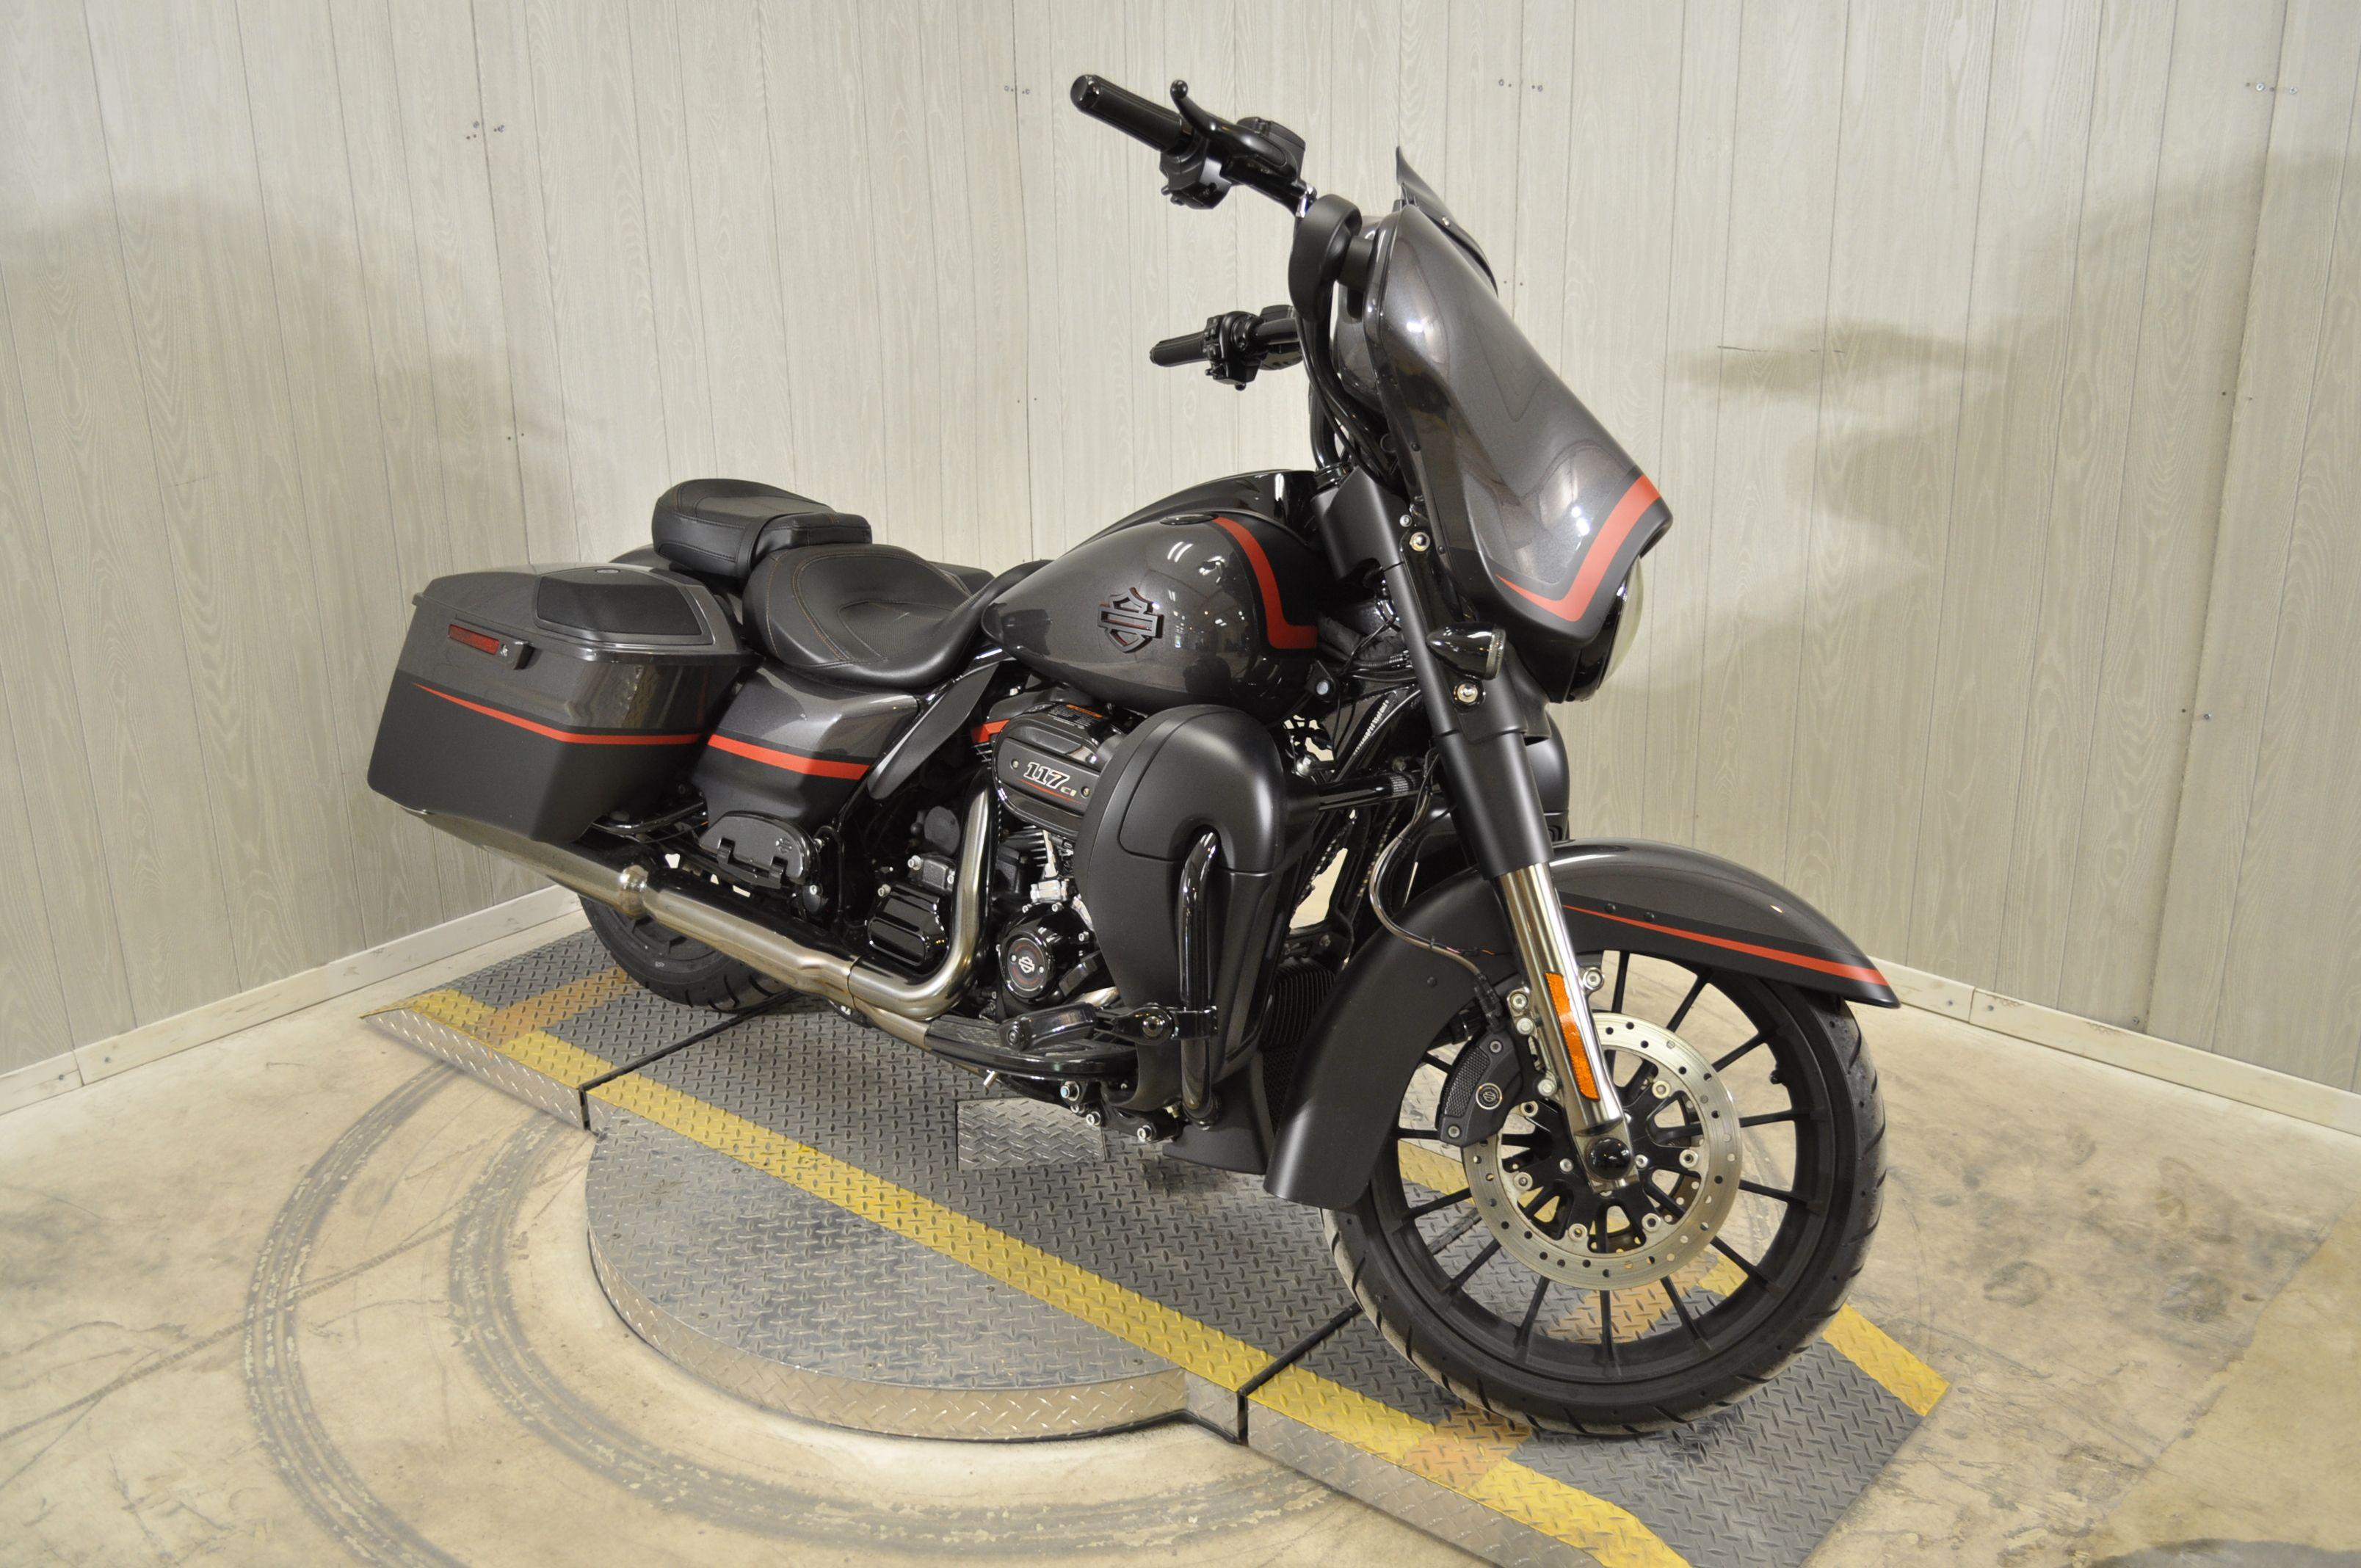 Pre-Owned 2018 Harley-Davidson CVO Street Glide FLHXSE